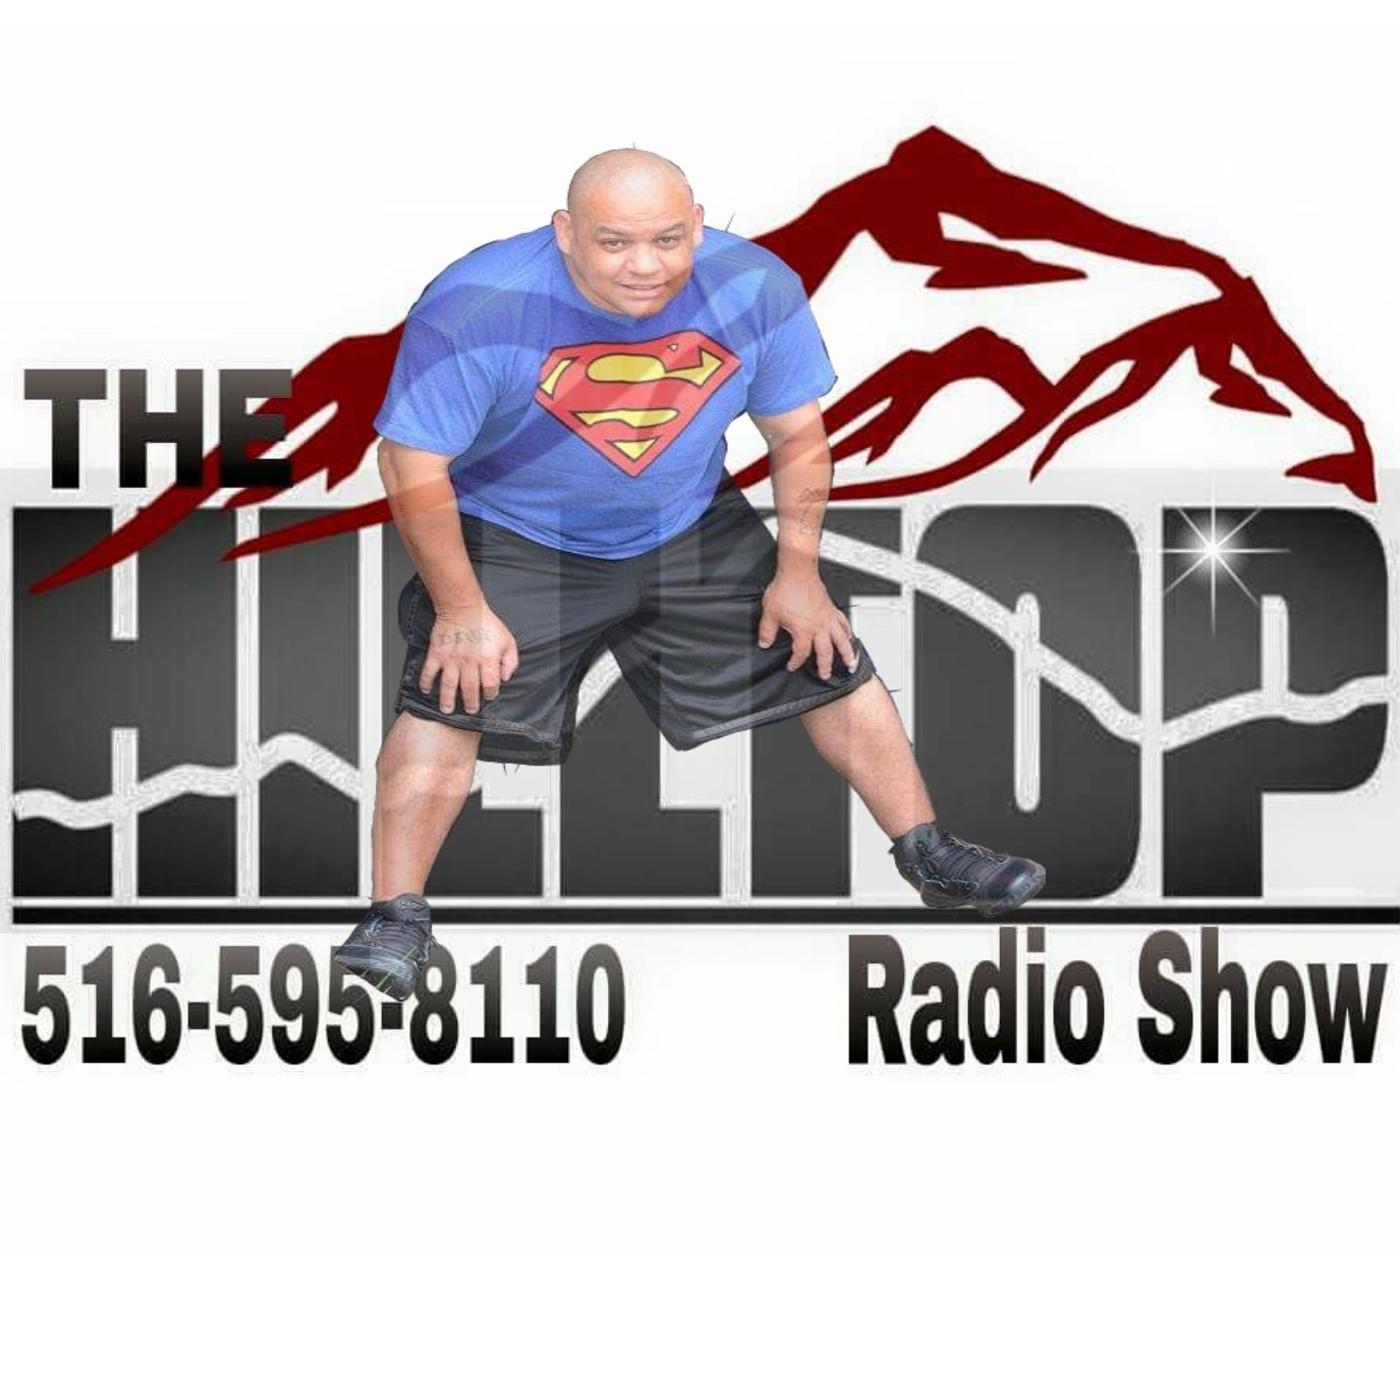 The Hilltop Radio Show's artwork